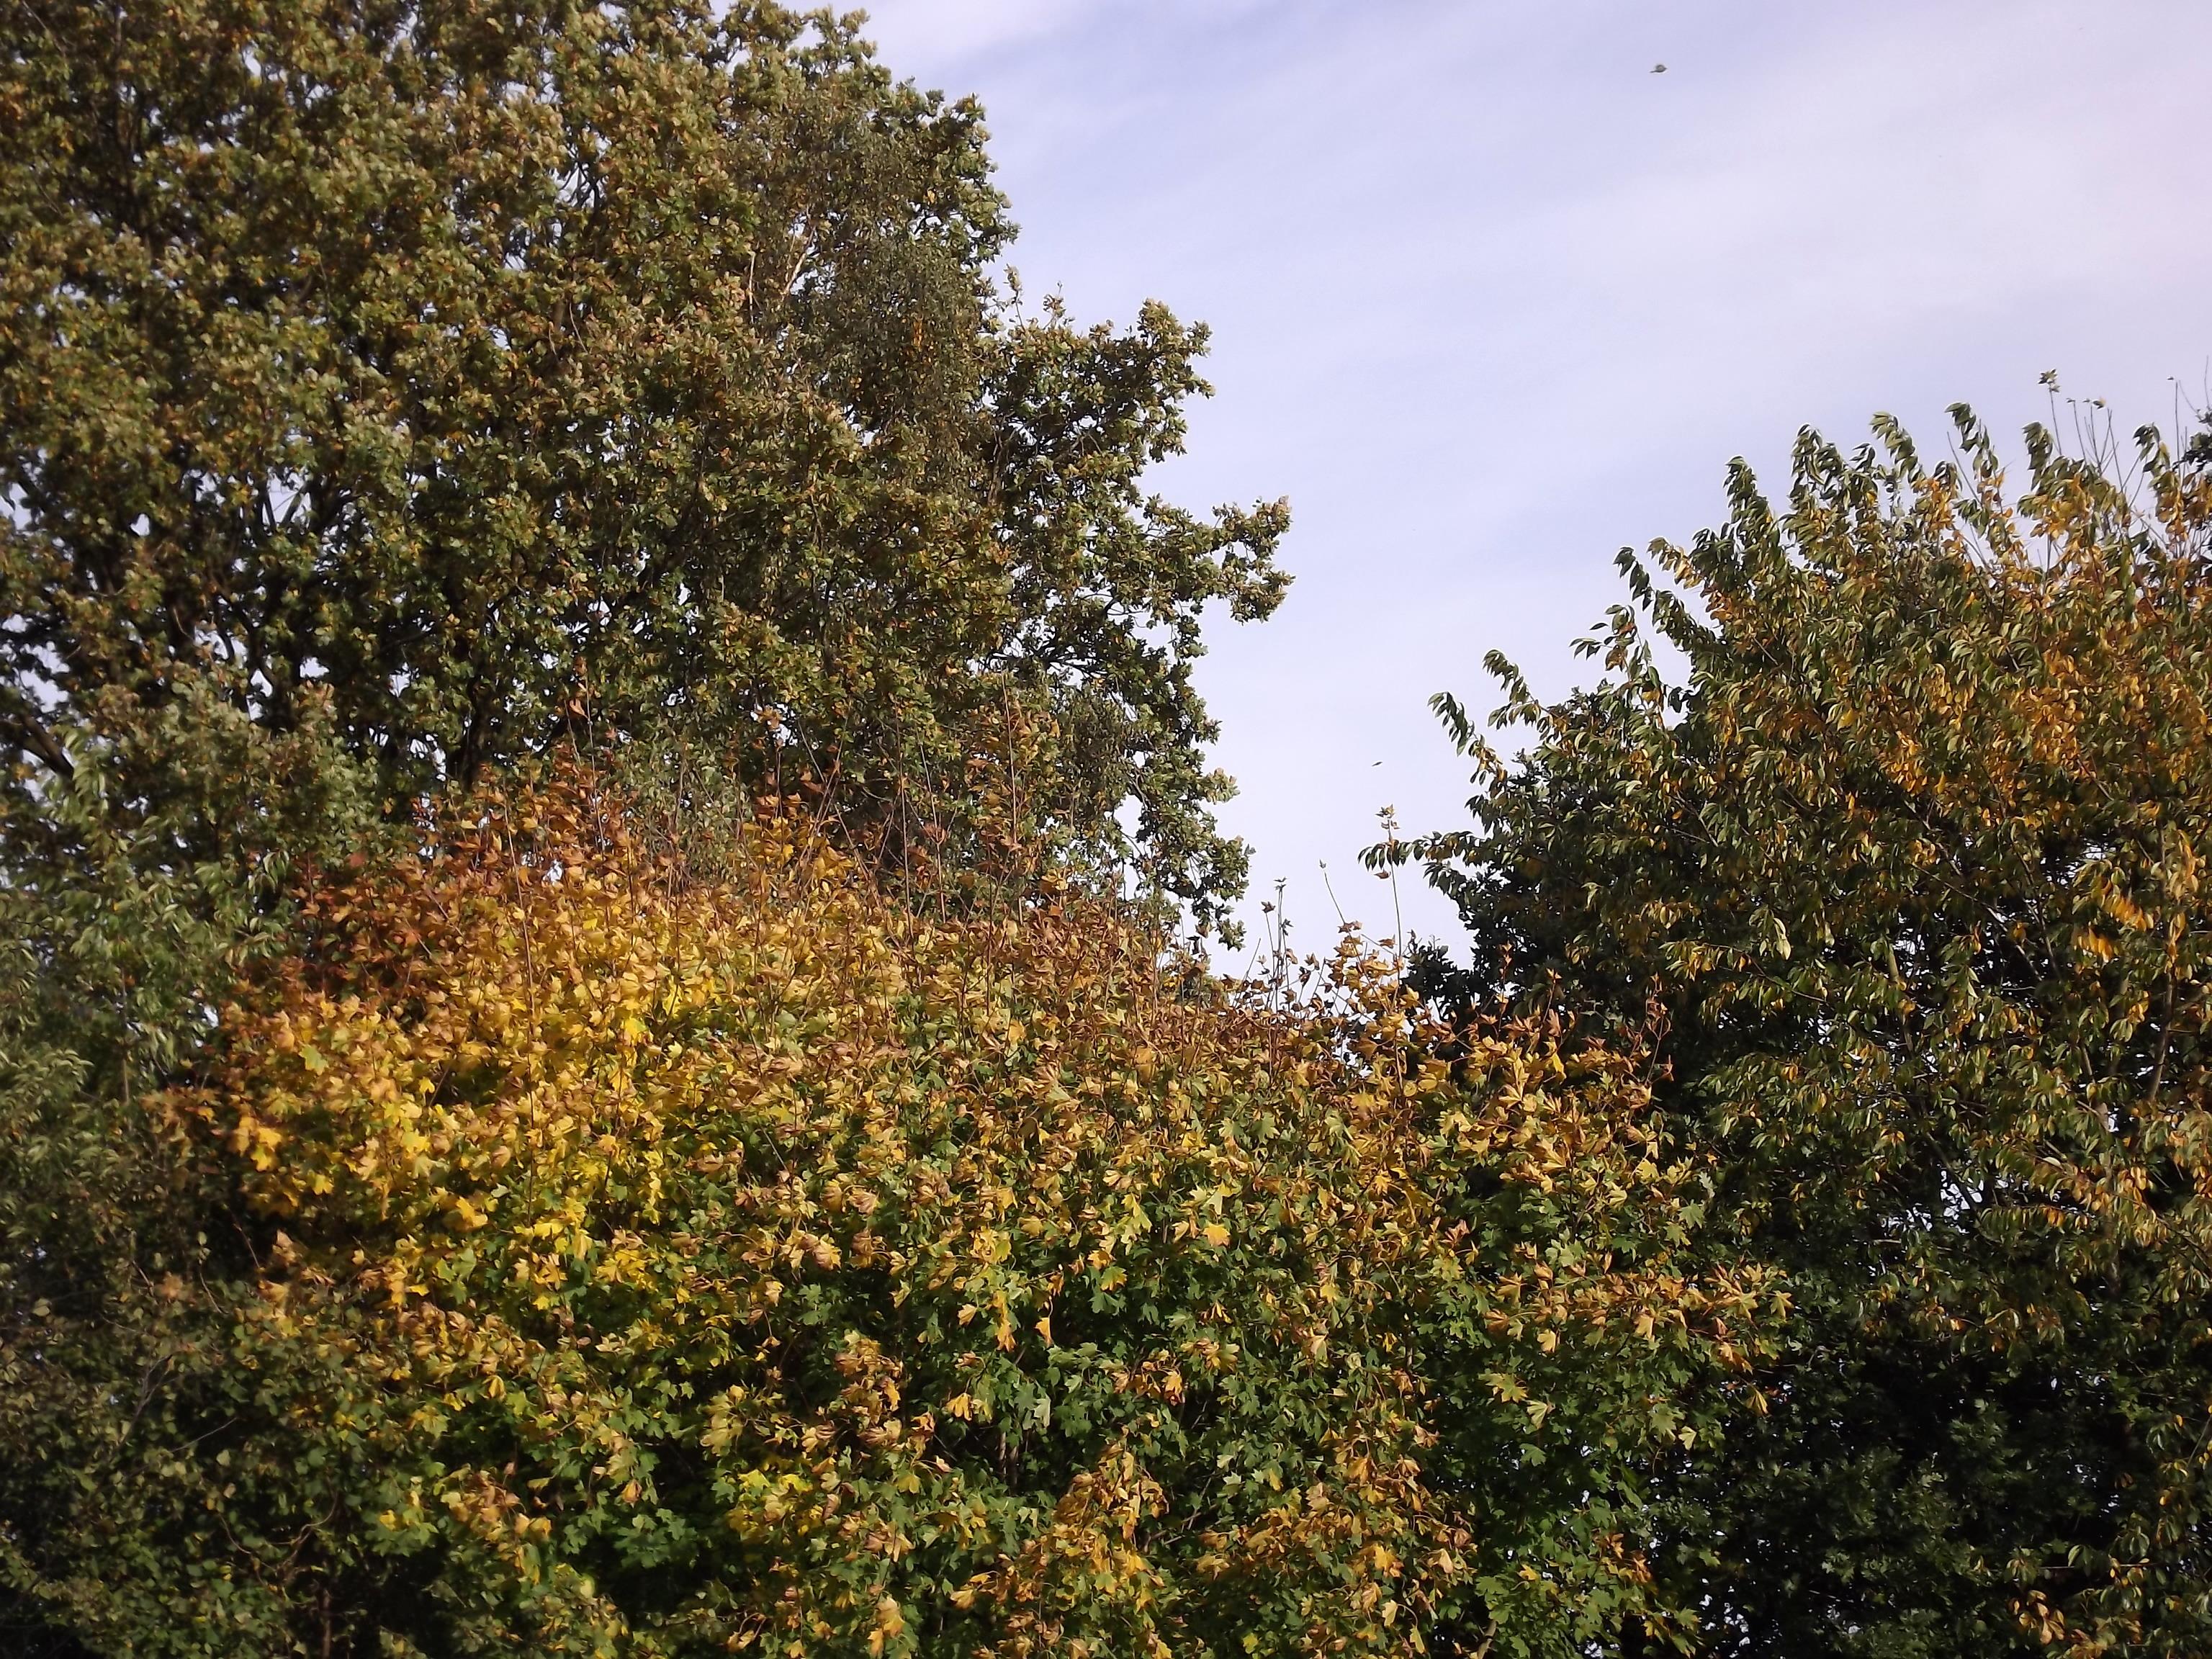 6537-blaetter-gruen-gelb-rot